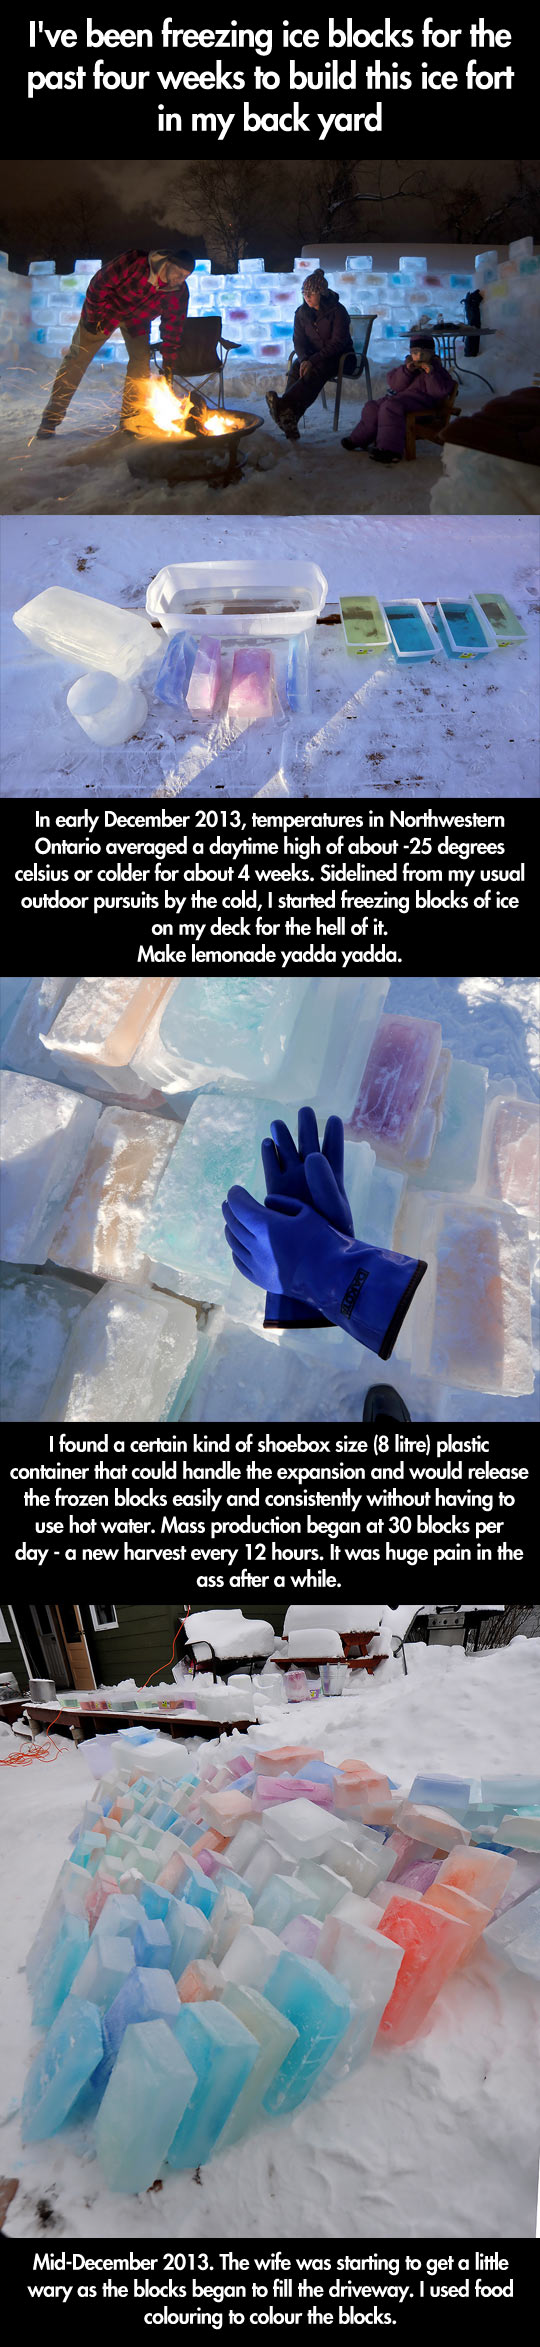 cool-blocks-ice-fort-backyard